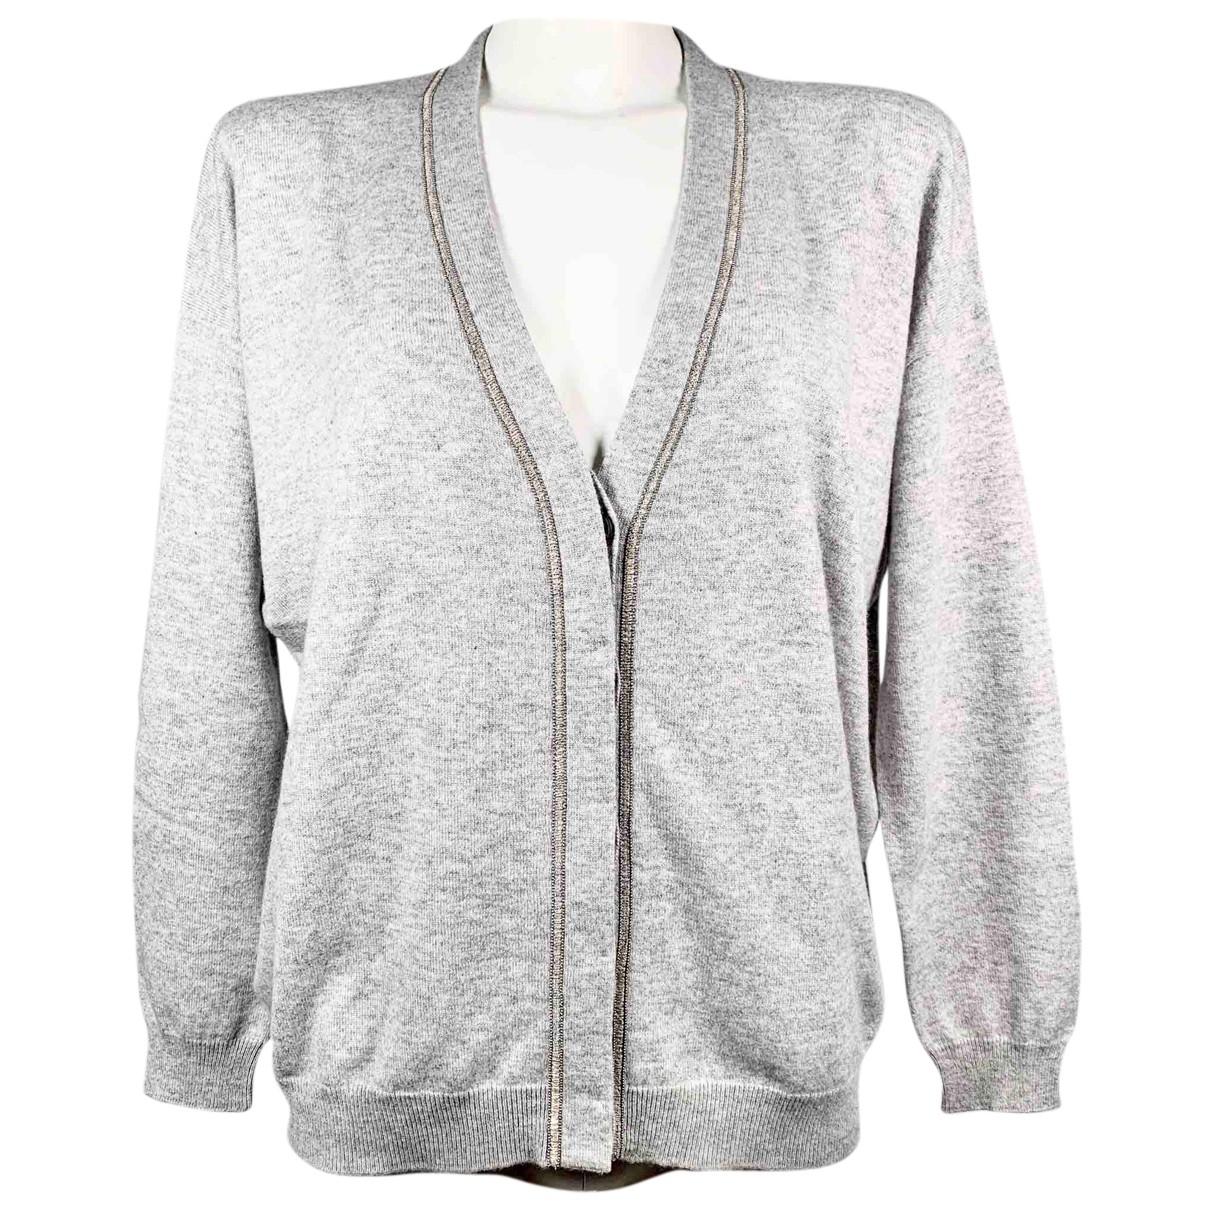 Brunello Cucinelli N Grey Cashmere Knitwear for Women L International